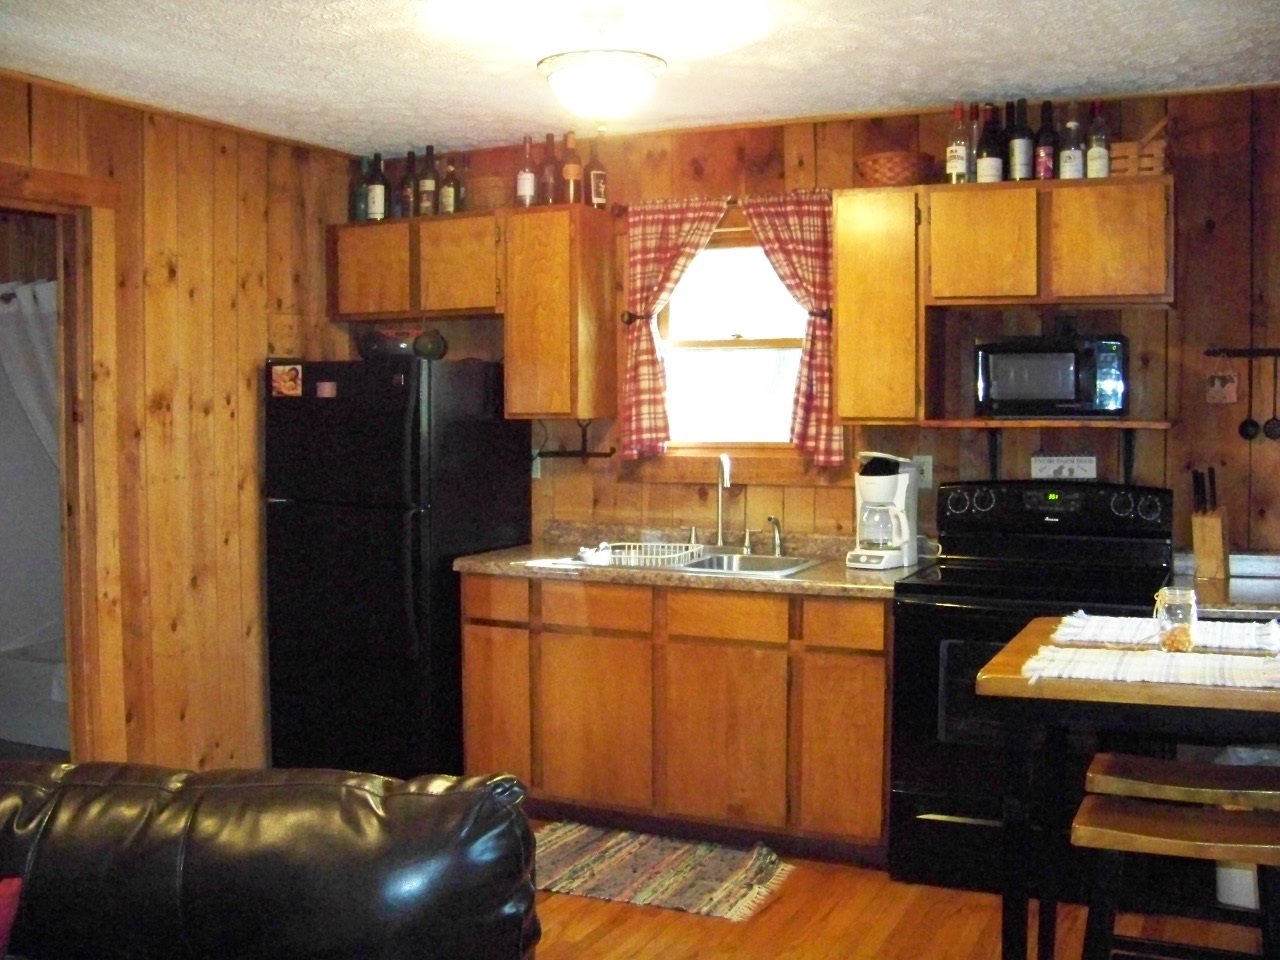 Hocking Hills Cabins - Hocking Hills Cottages and Cabins